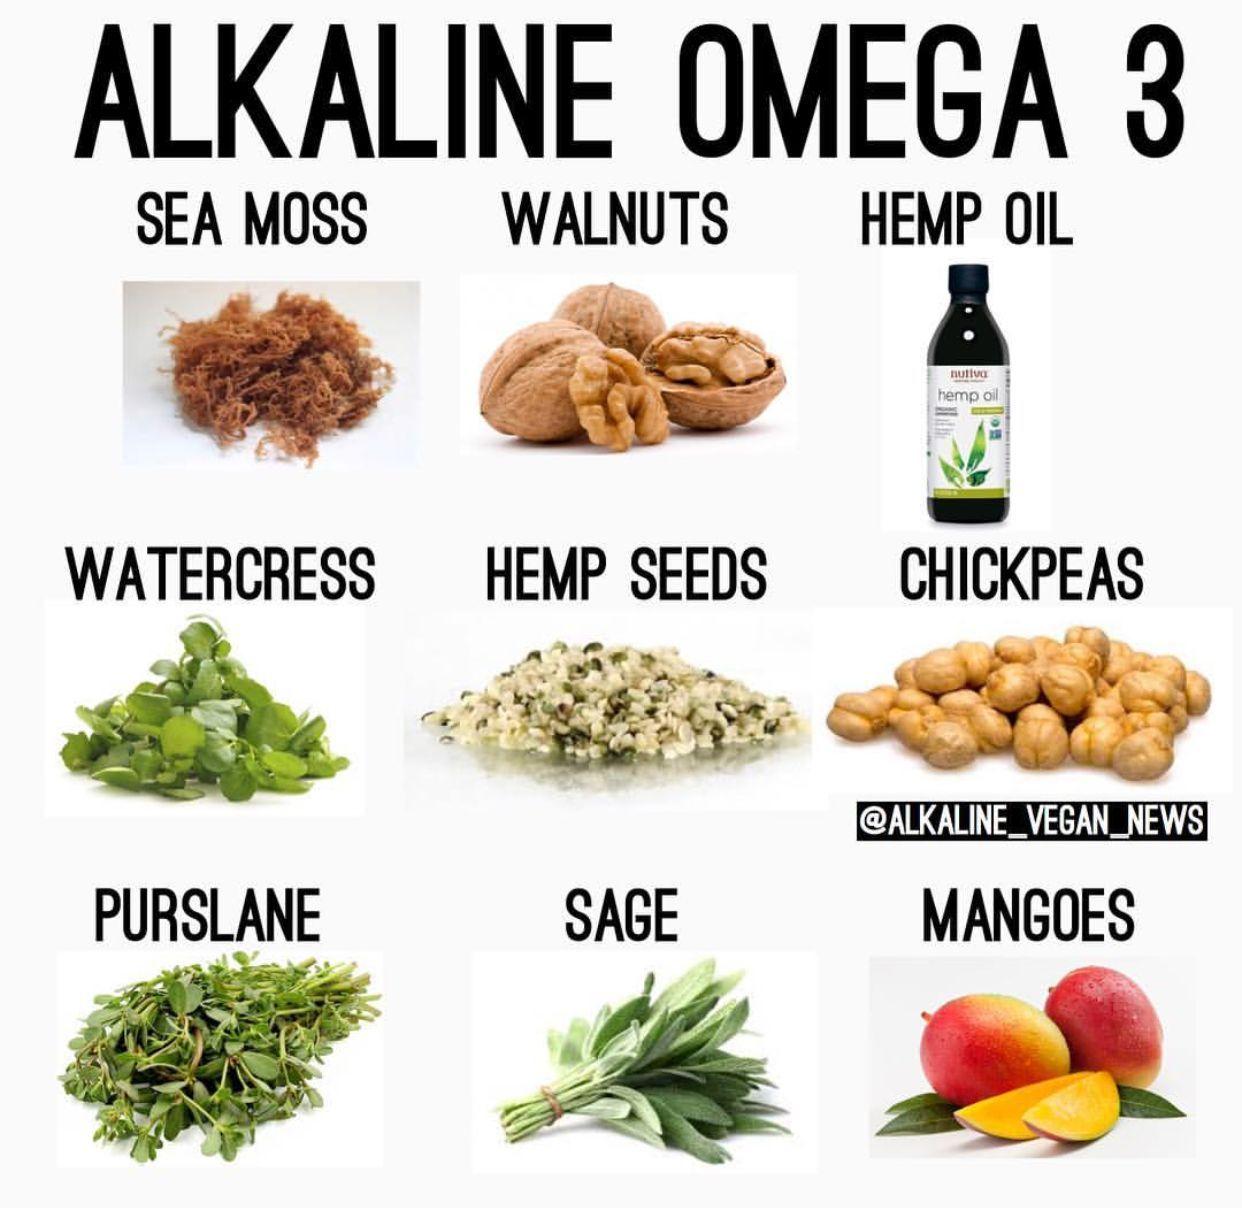 Alkaline Omega 3 Alkalinerecipes Dr Sebi Alkaline Food Alkaline Diet Recipes Alkaline Diet